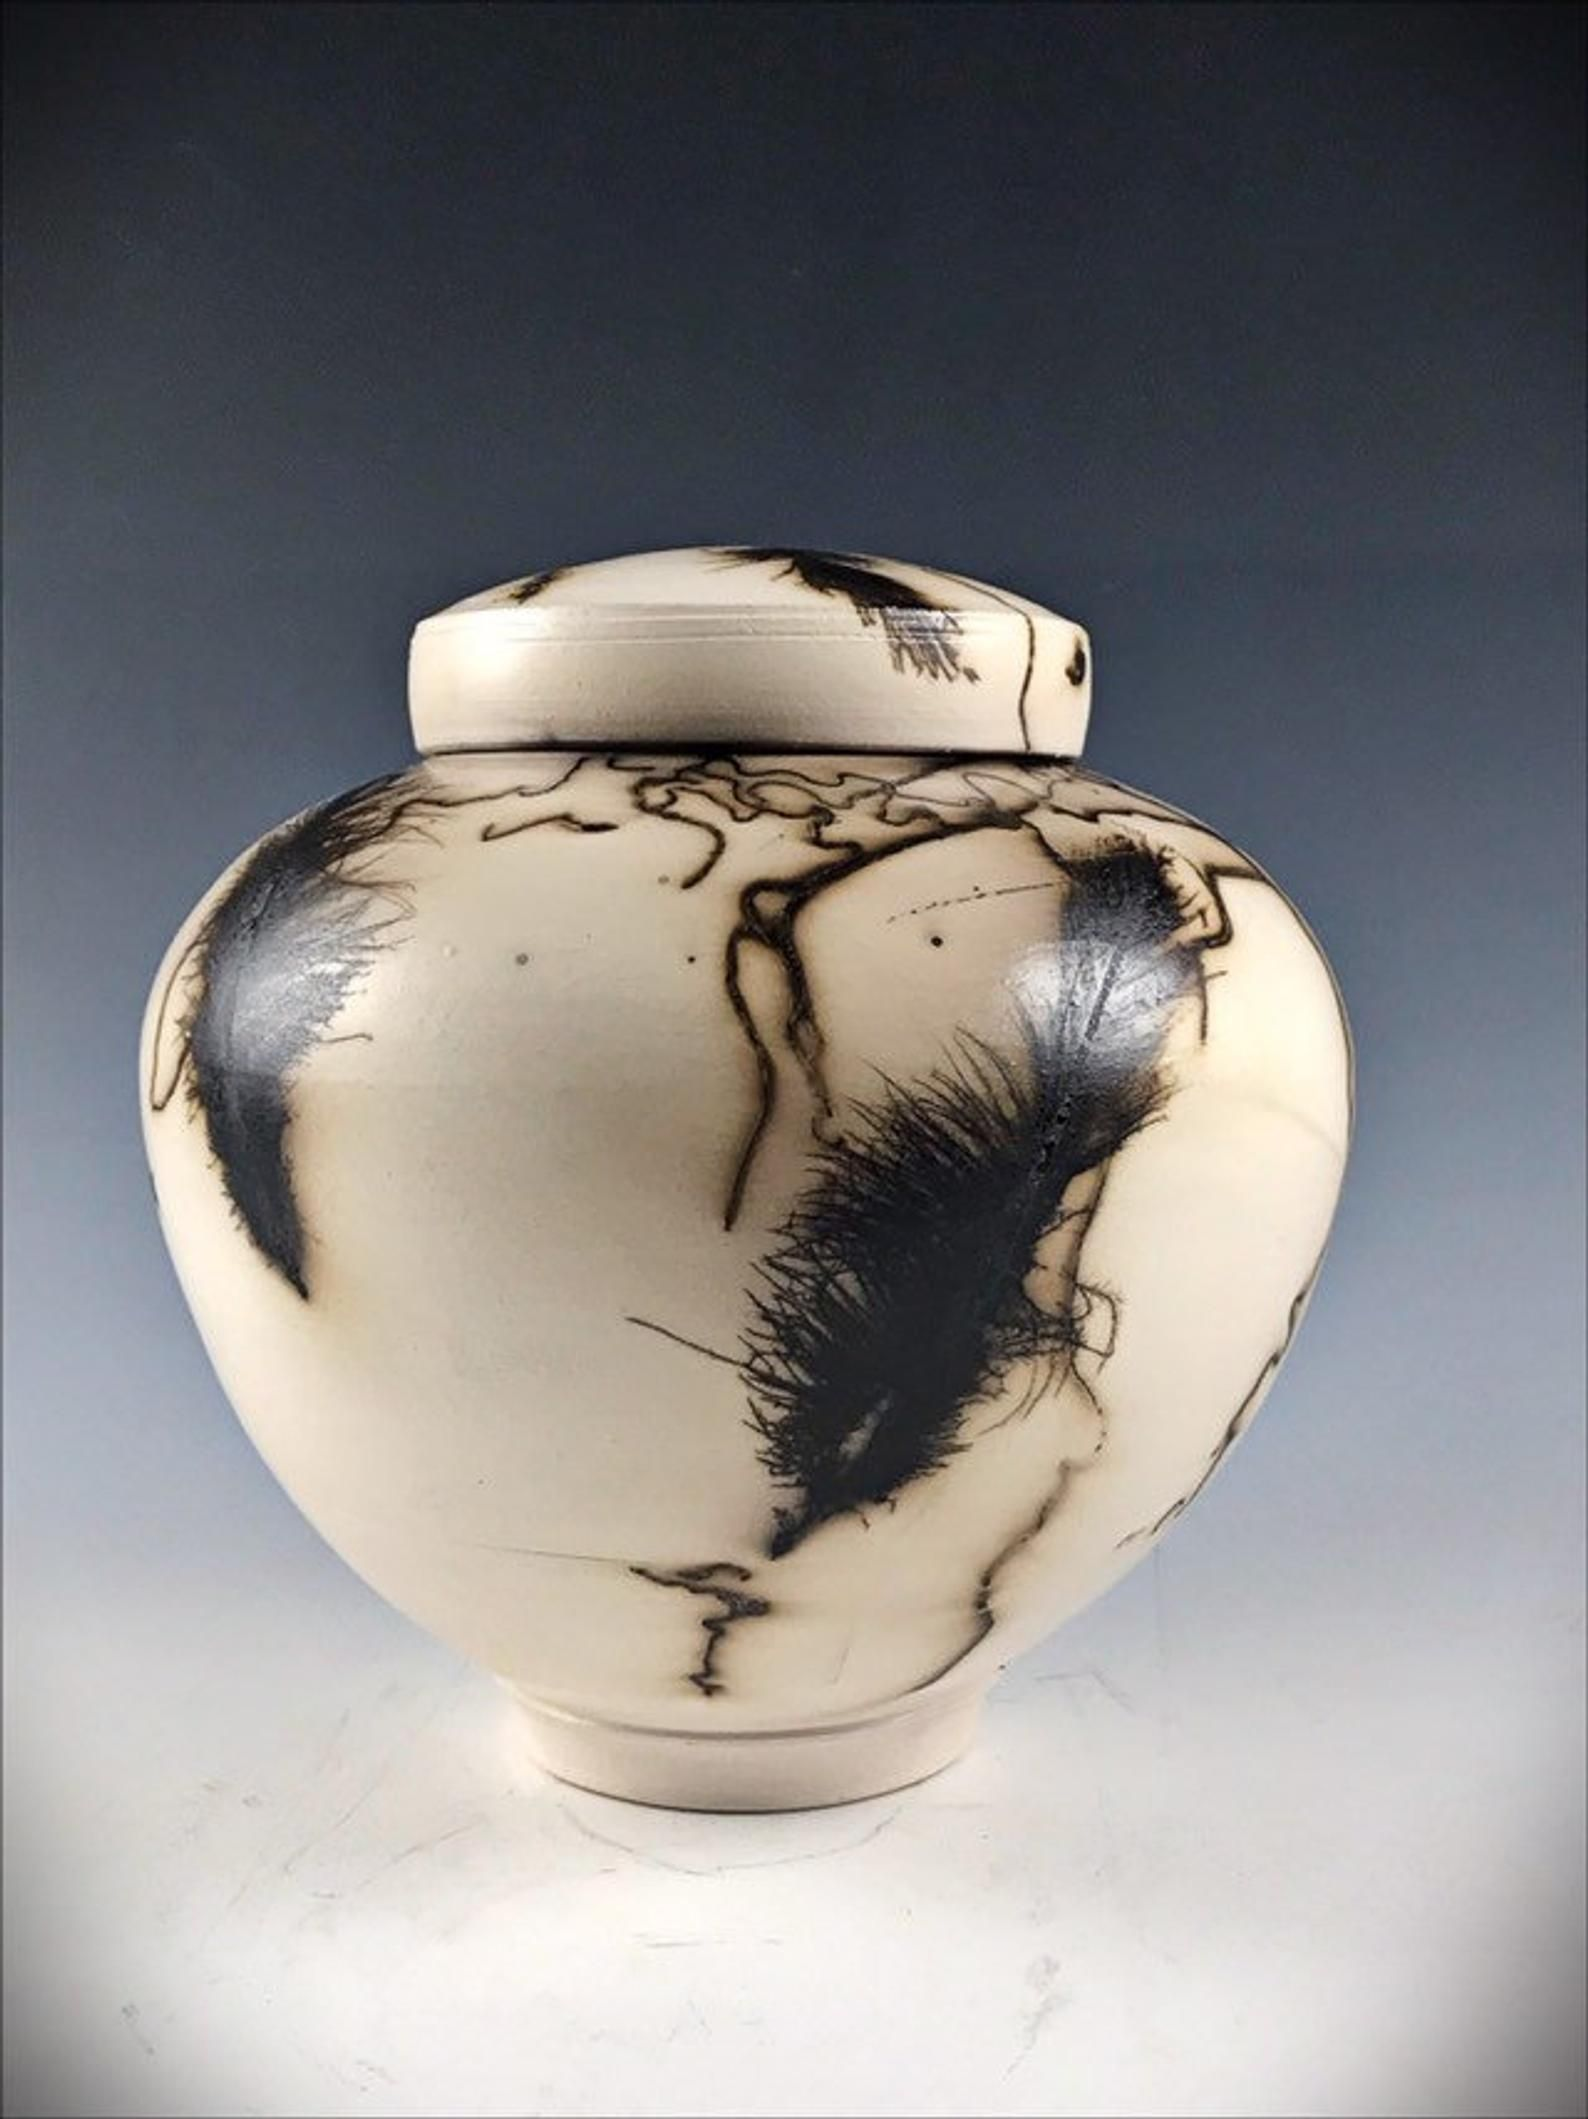 Ceramic Pet Urn Urn or Keepsake Urn Horsehair Alternative